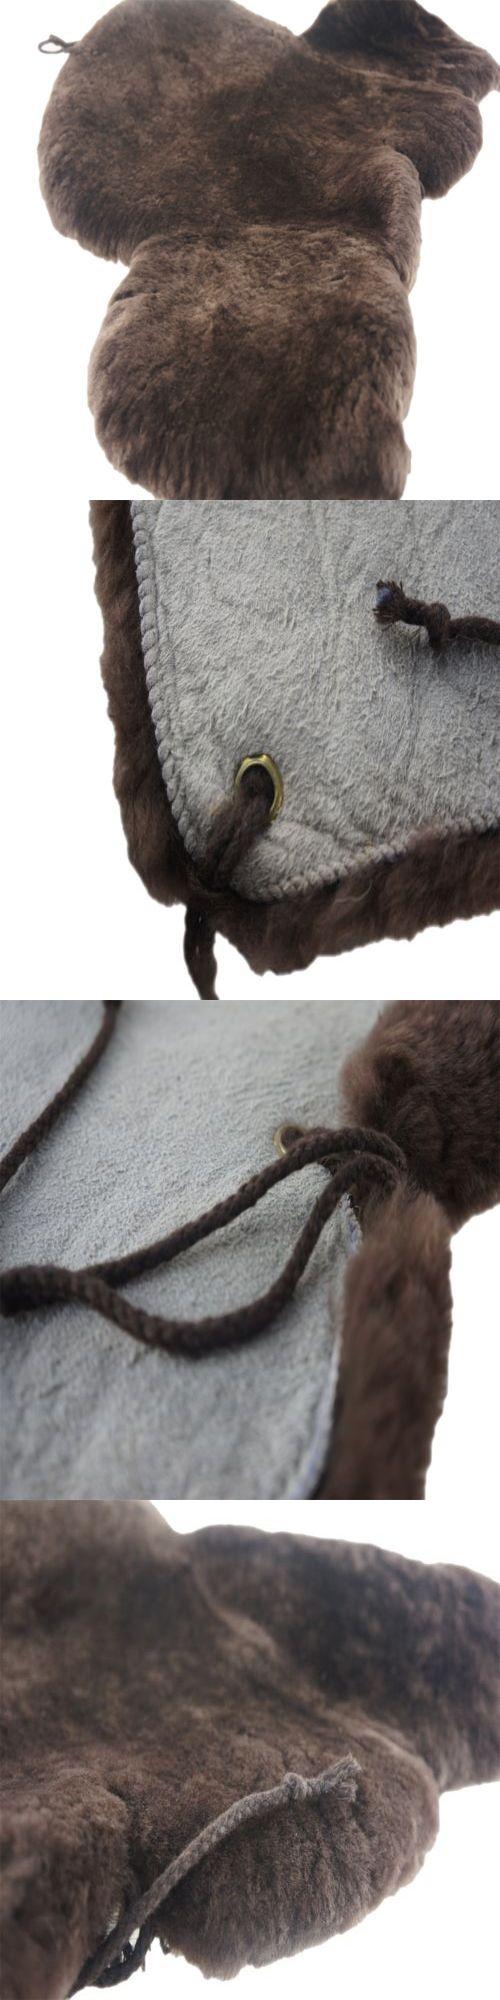 Saddle Covers 179000: Vast Superb Sheepskin Scrap Western Saddle Seat Saver Fleece Saddle Cover 390 -> BUY IT NOW ONLY: $87.99 on eBay!